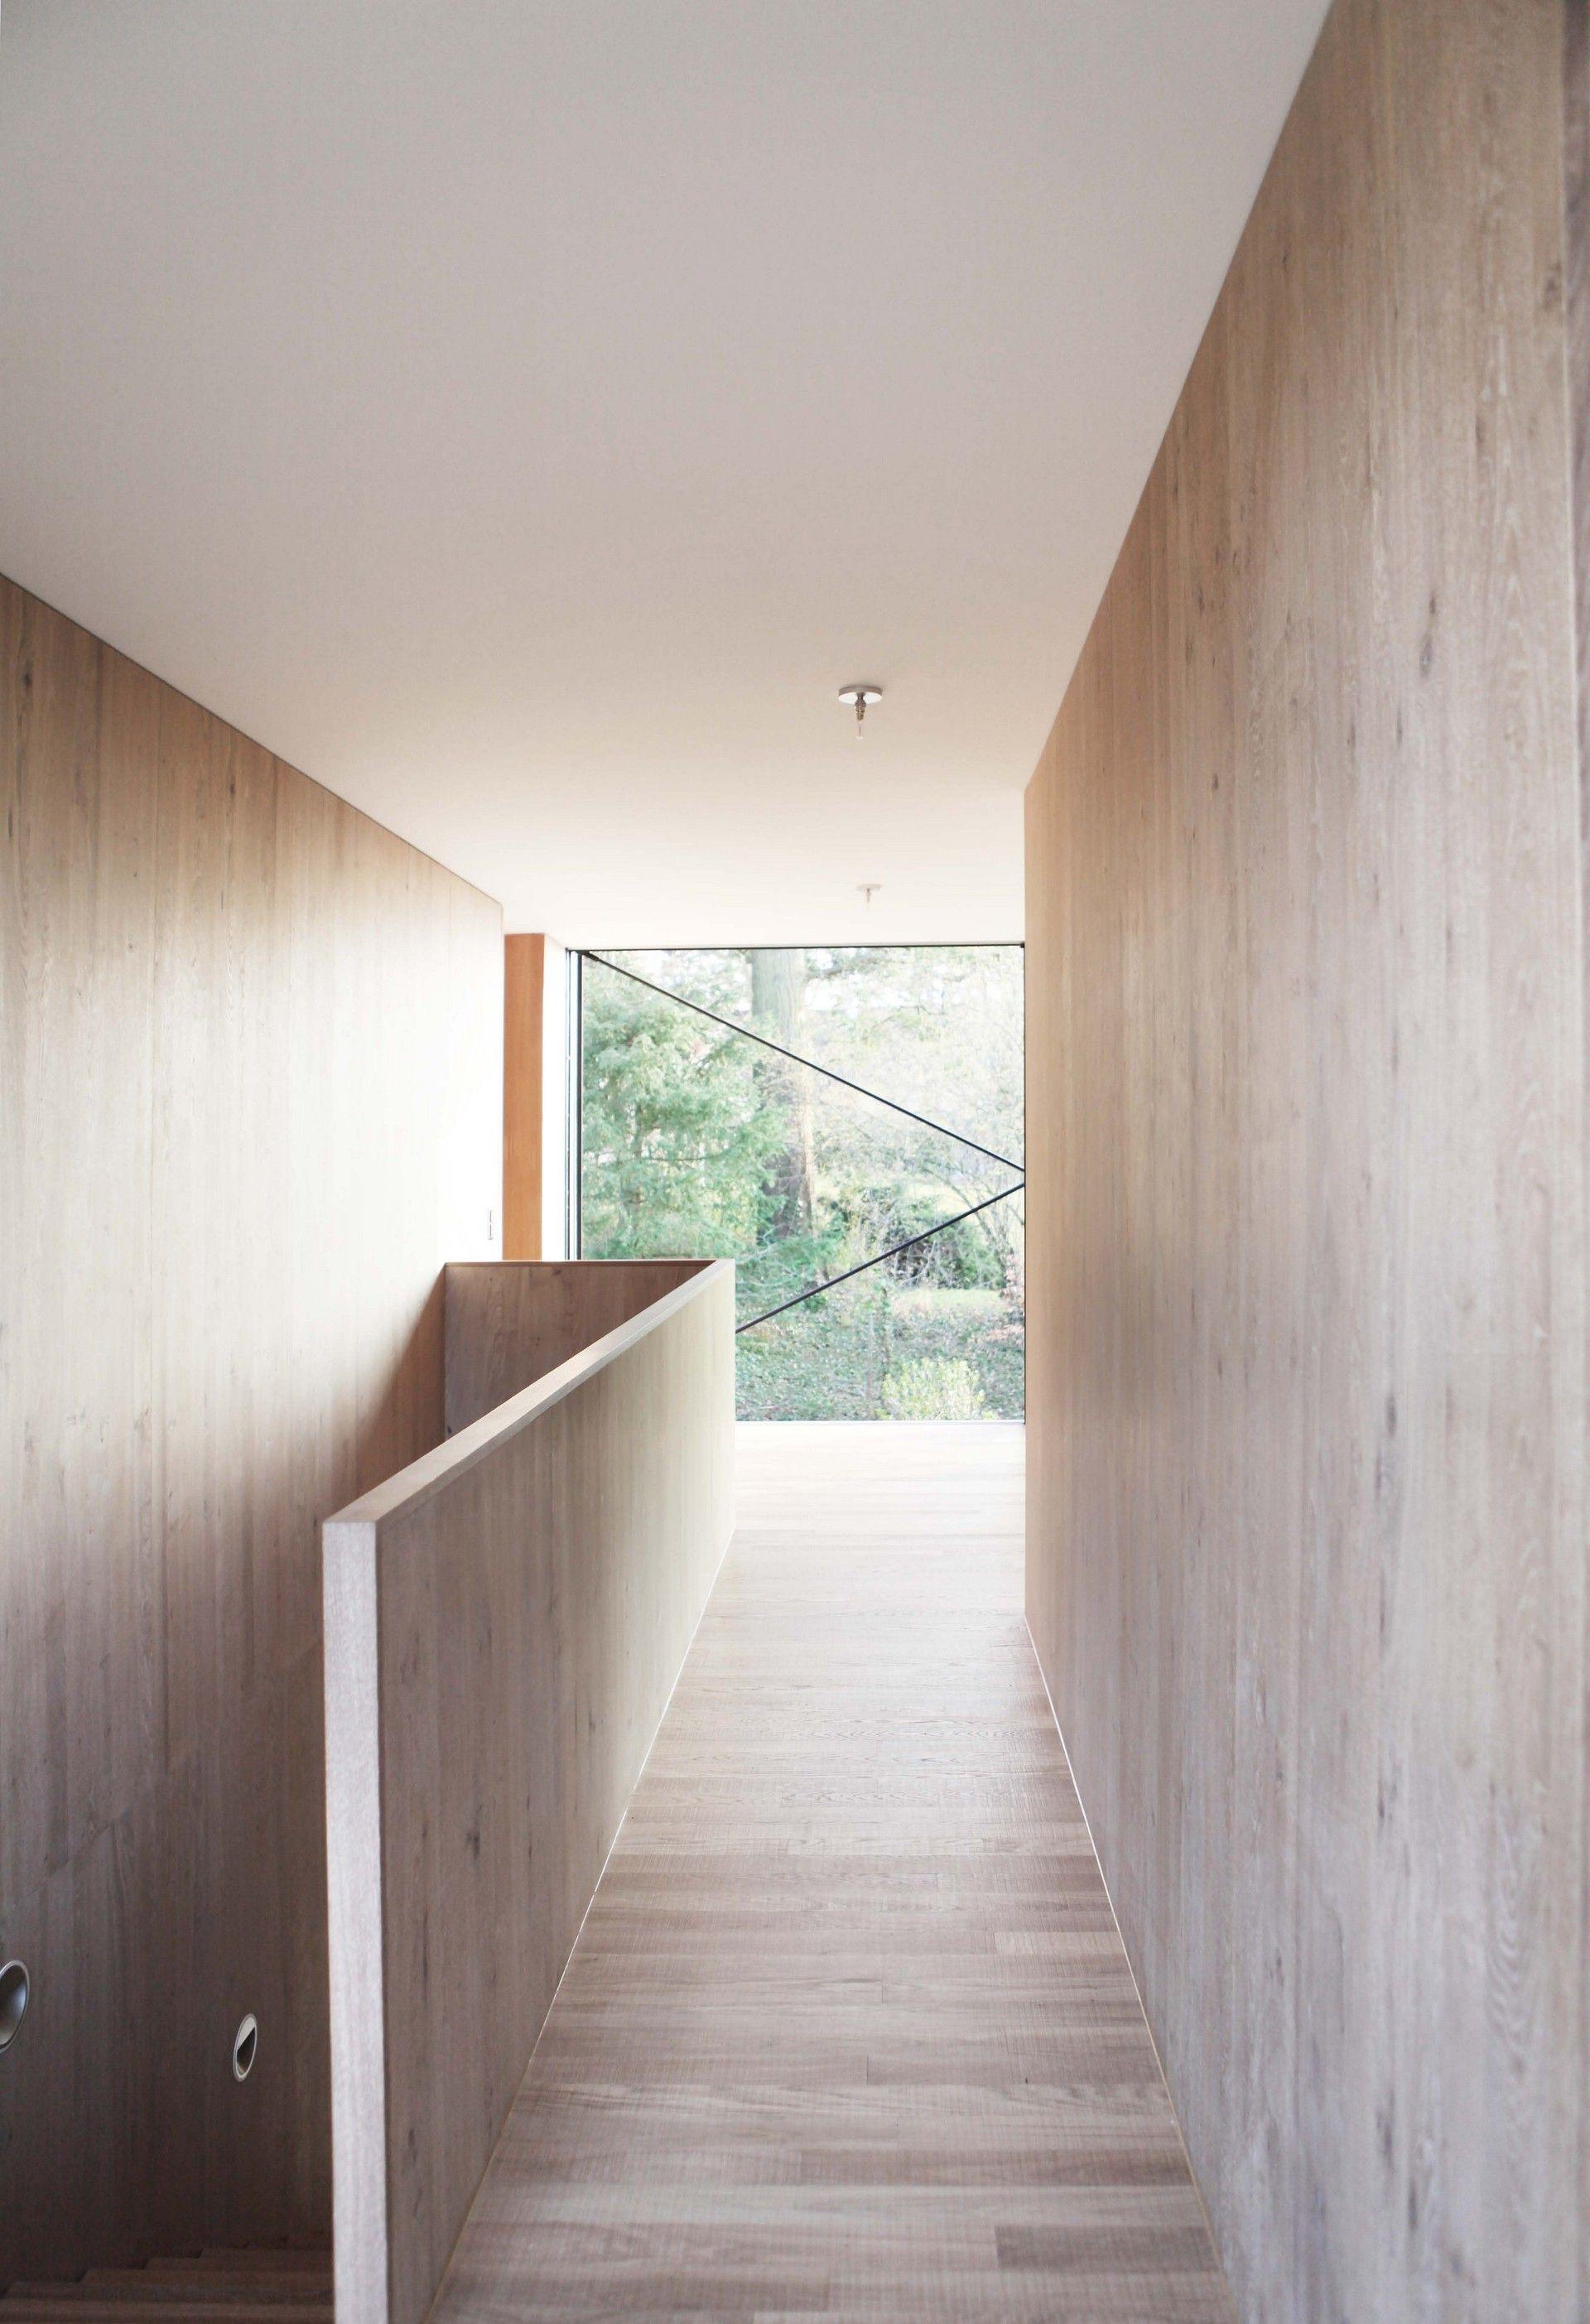 Pin by Fuyi Tsai on Architecture   Pinterest   Concrete wood ...